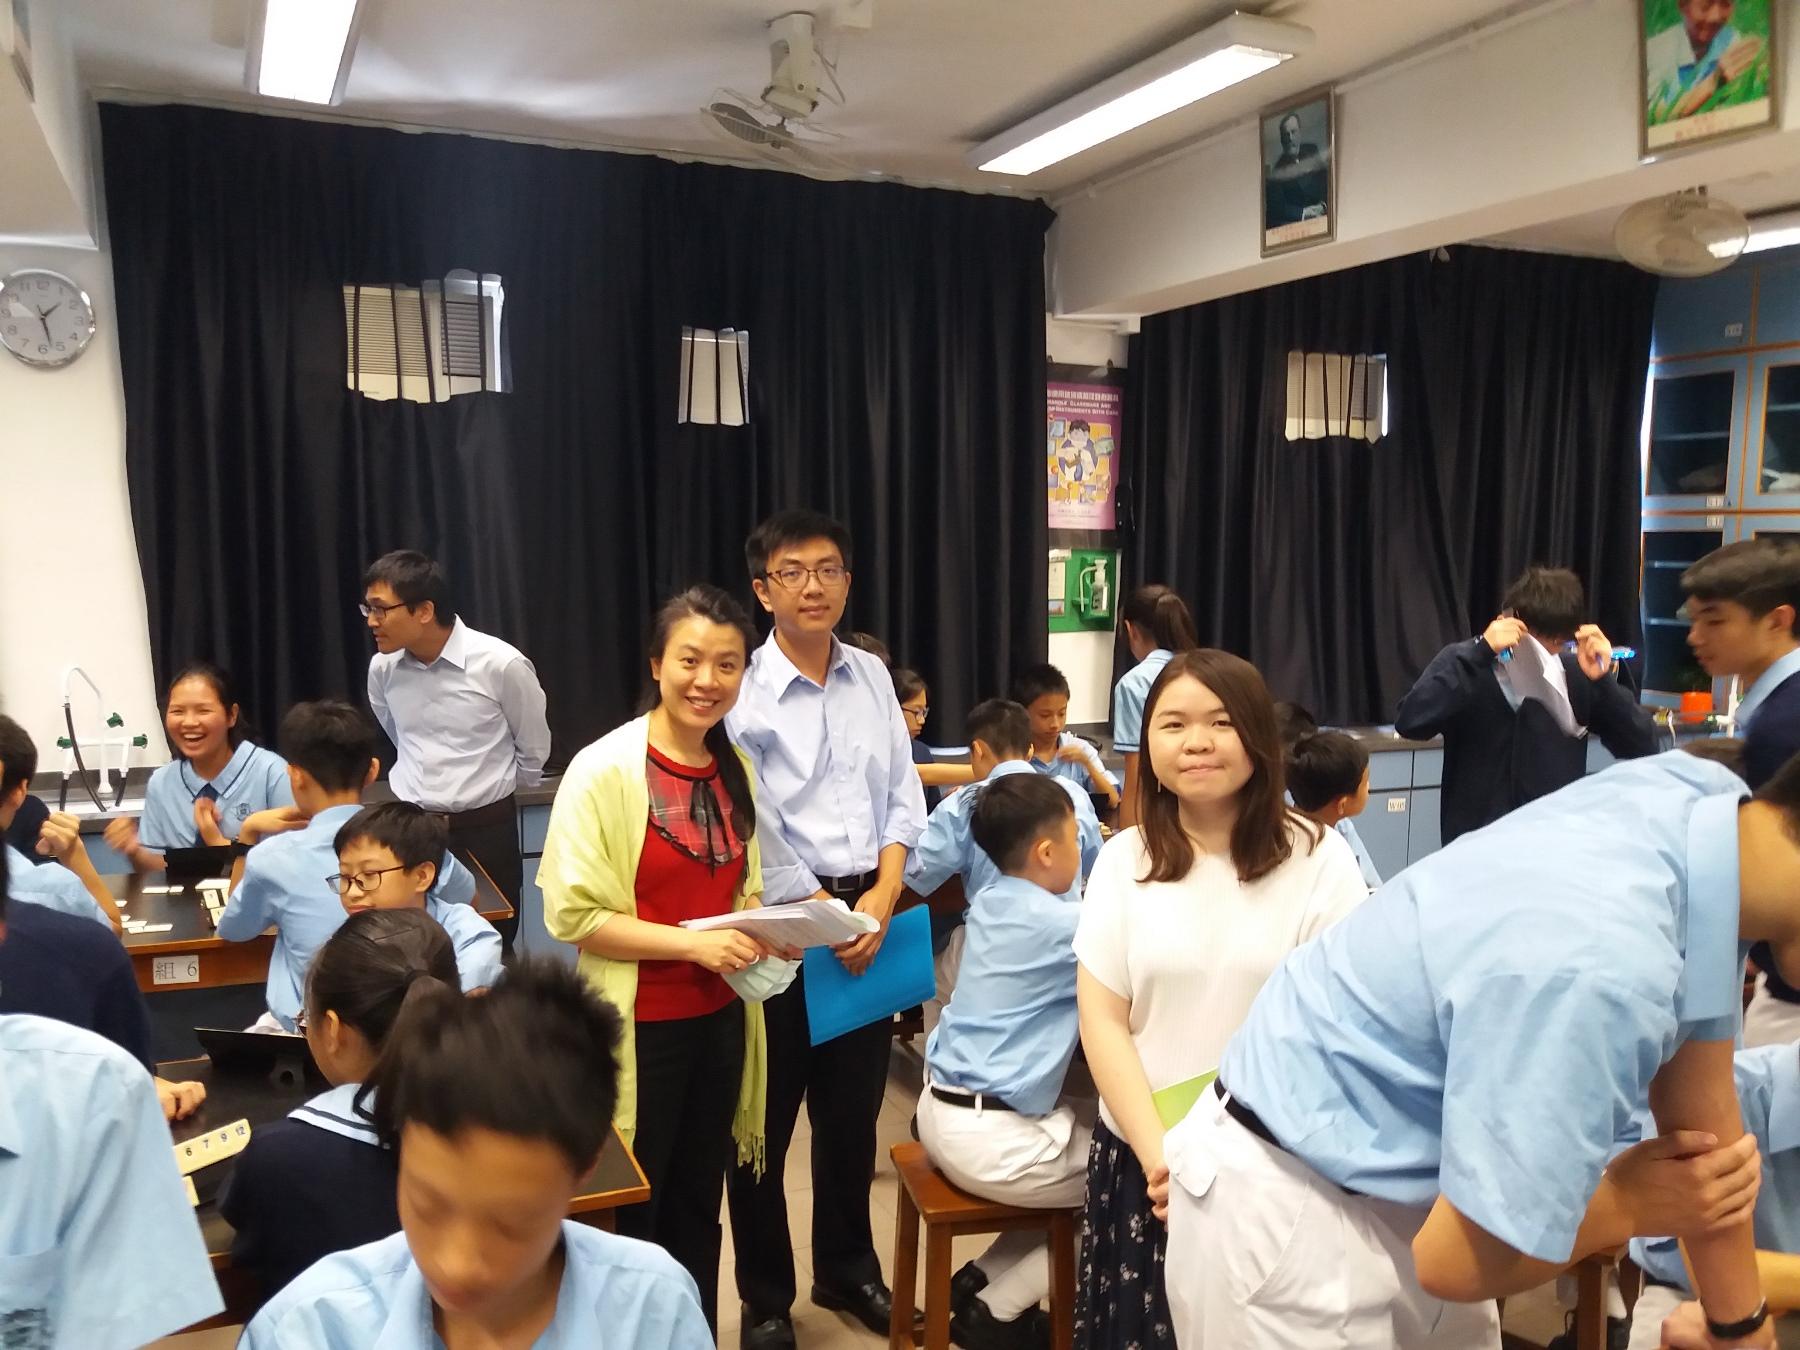 https://www.npc.edu.hk/sites/default/files/20191023_132933.jpg